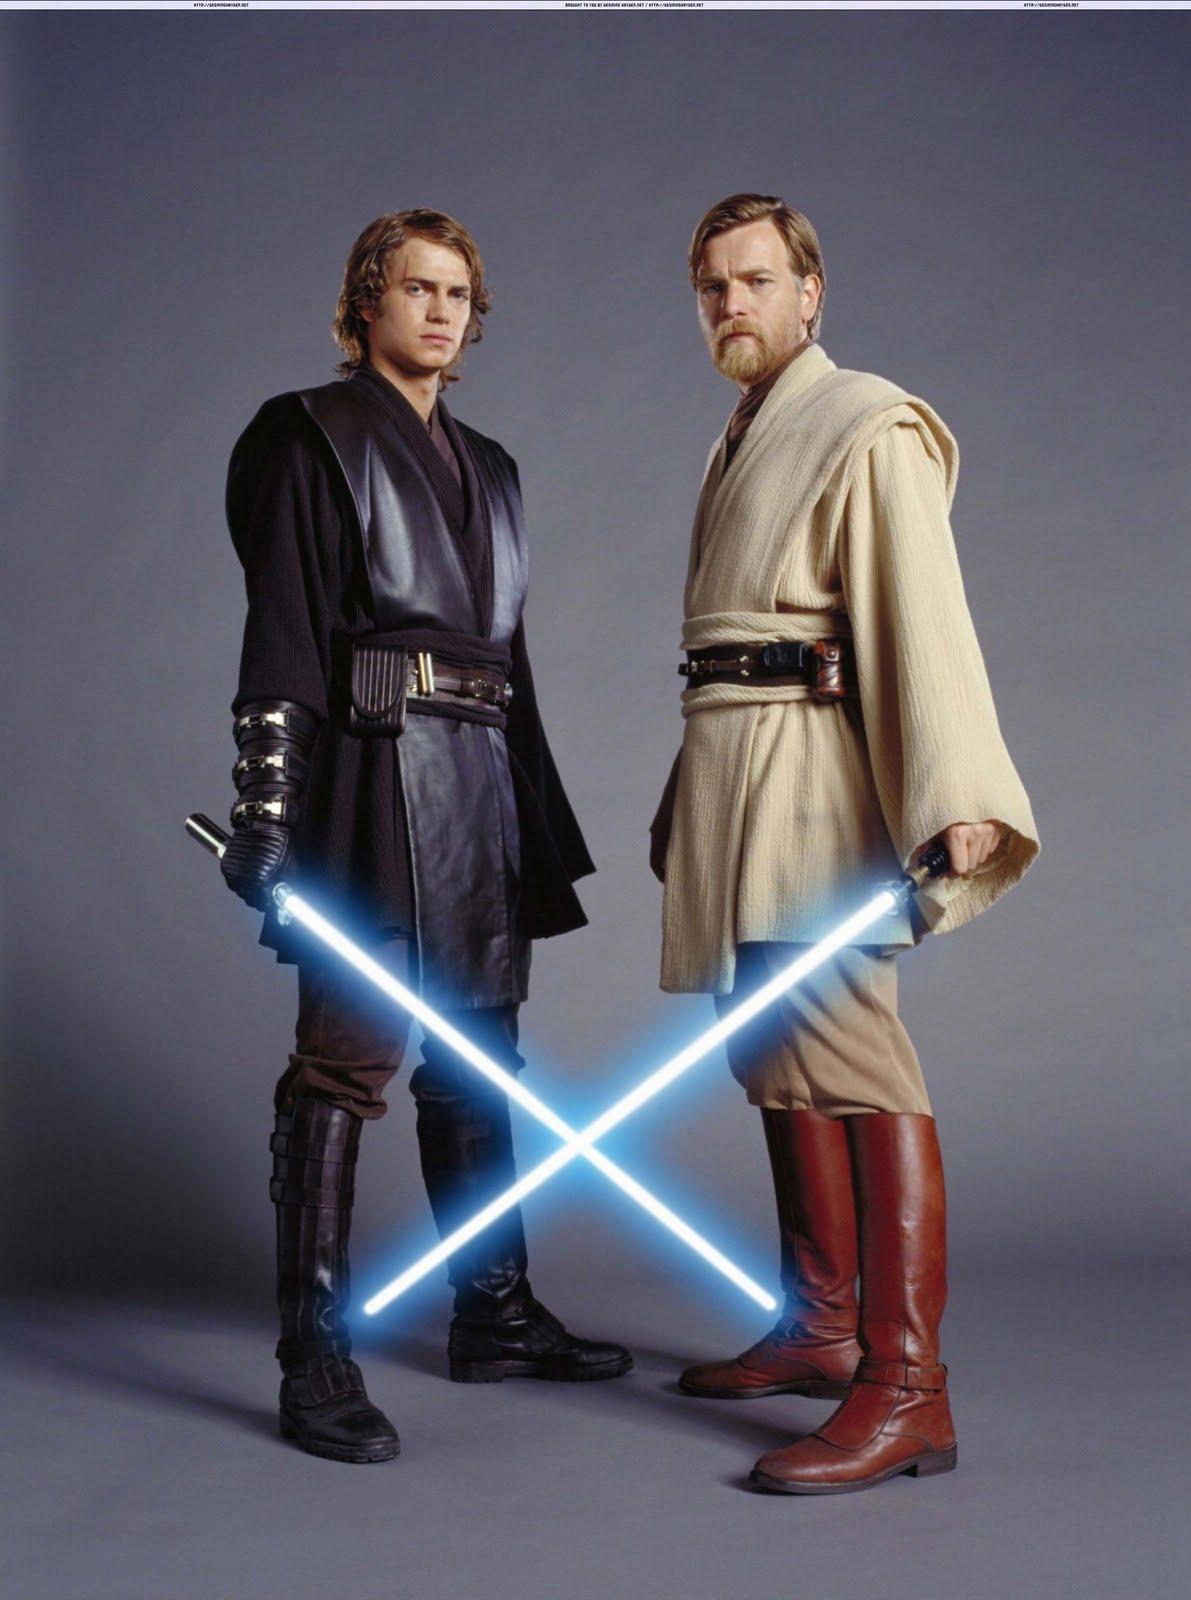 High Quality Star Wars Episode 3 Anakin Skywalker Wallpaper